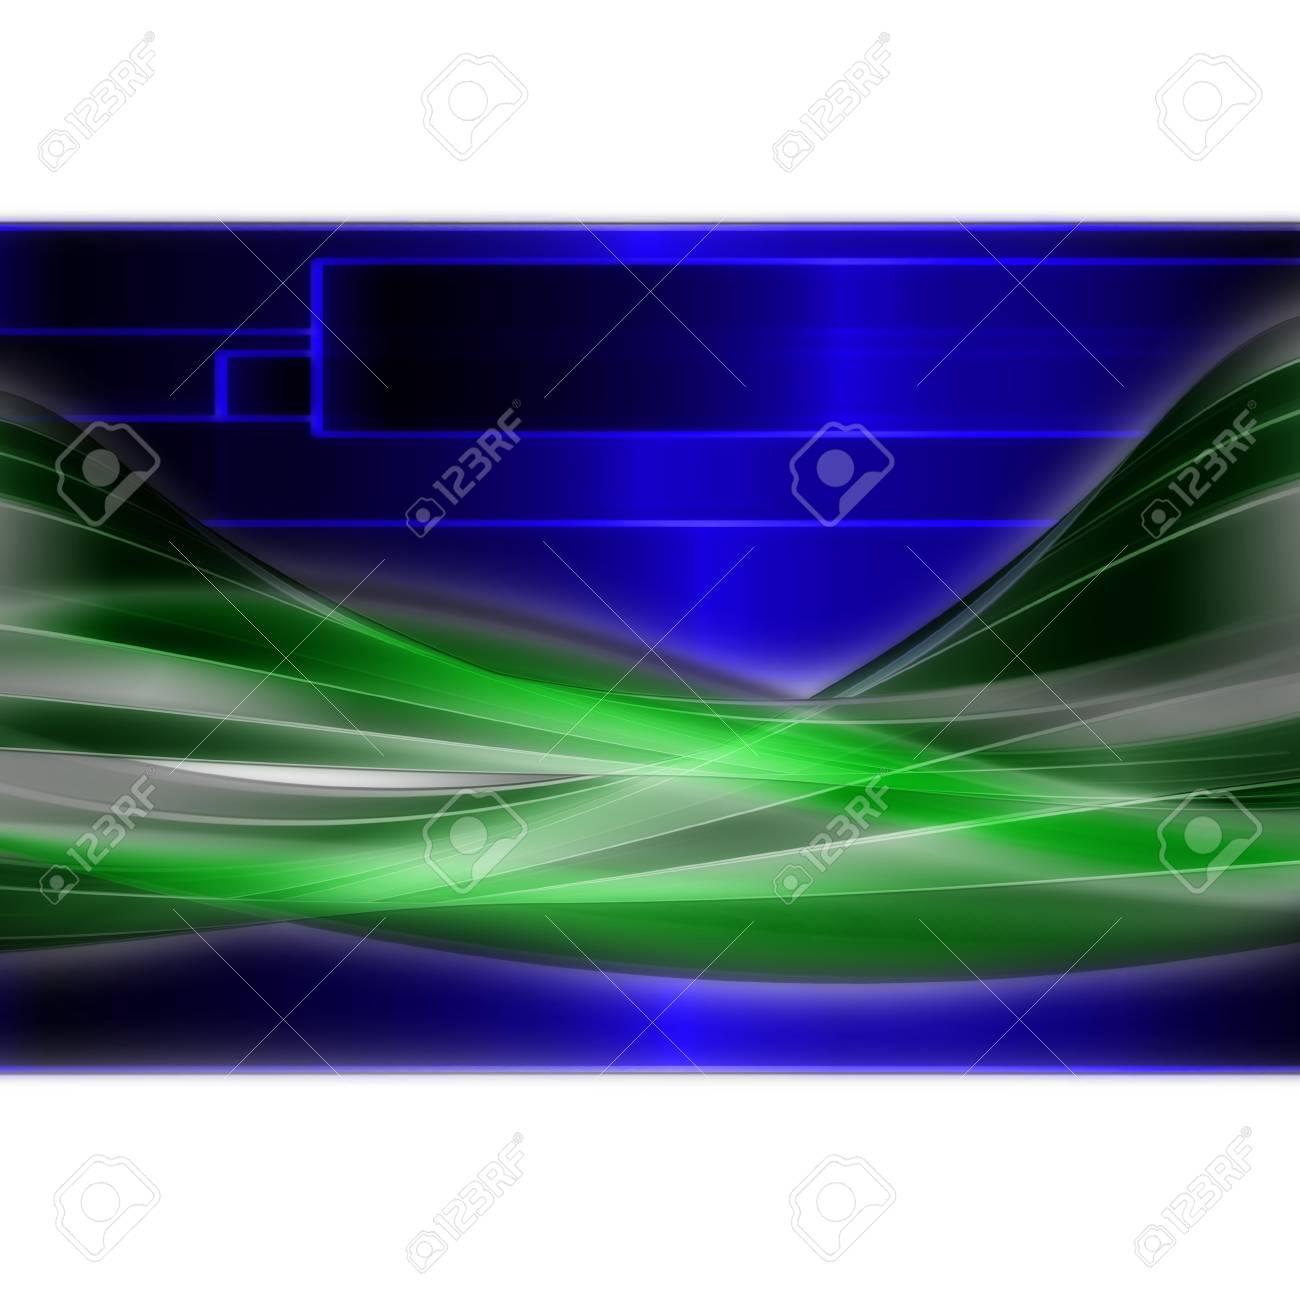 Fantastic abstract elegant and powerful background design illustration Stock Illustration - 10811148